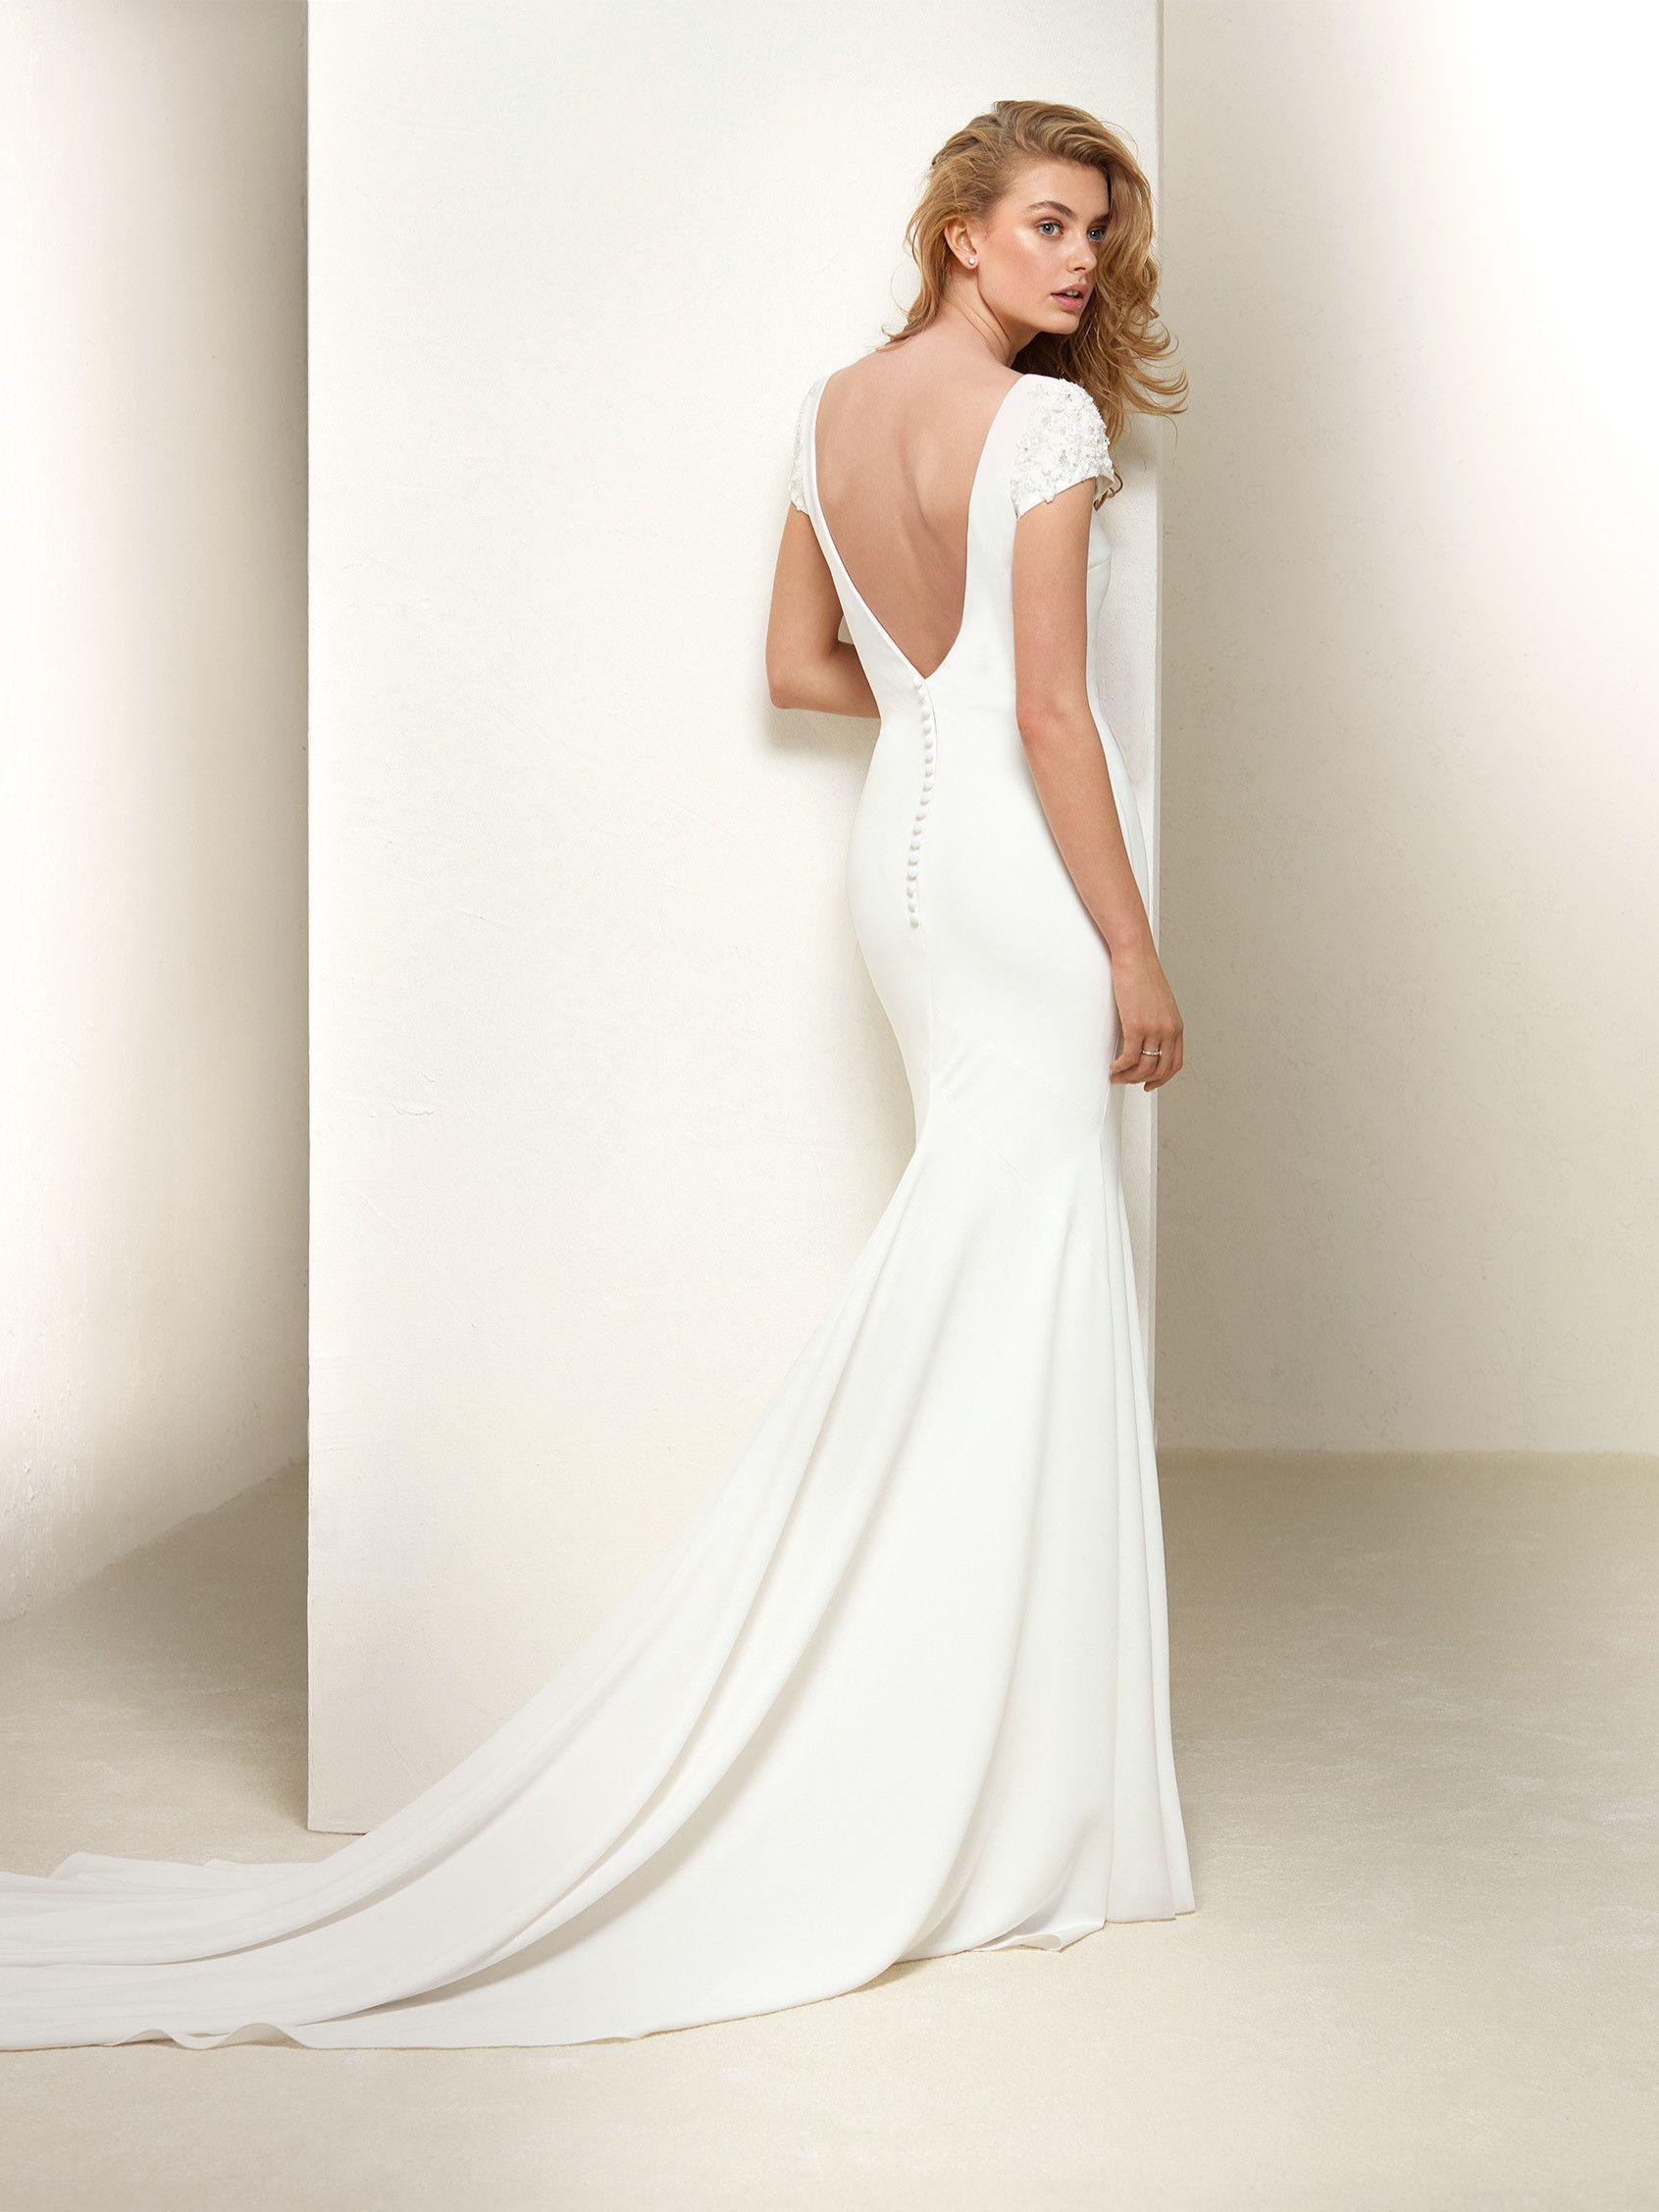 Brautkleid Ärmel japanischer Stil | Bridal | Pinterest | Japanese ...